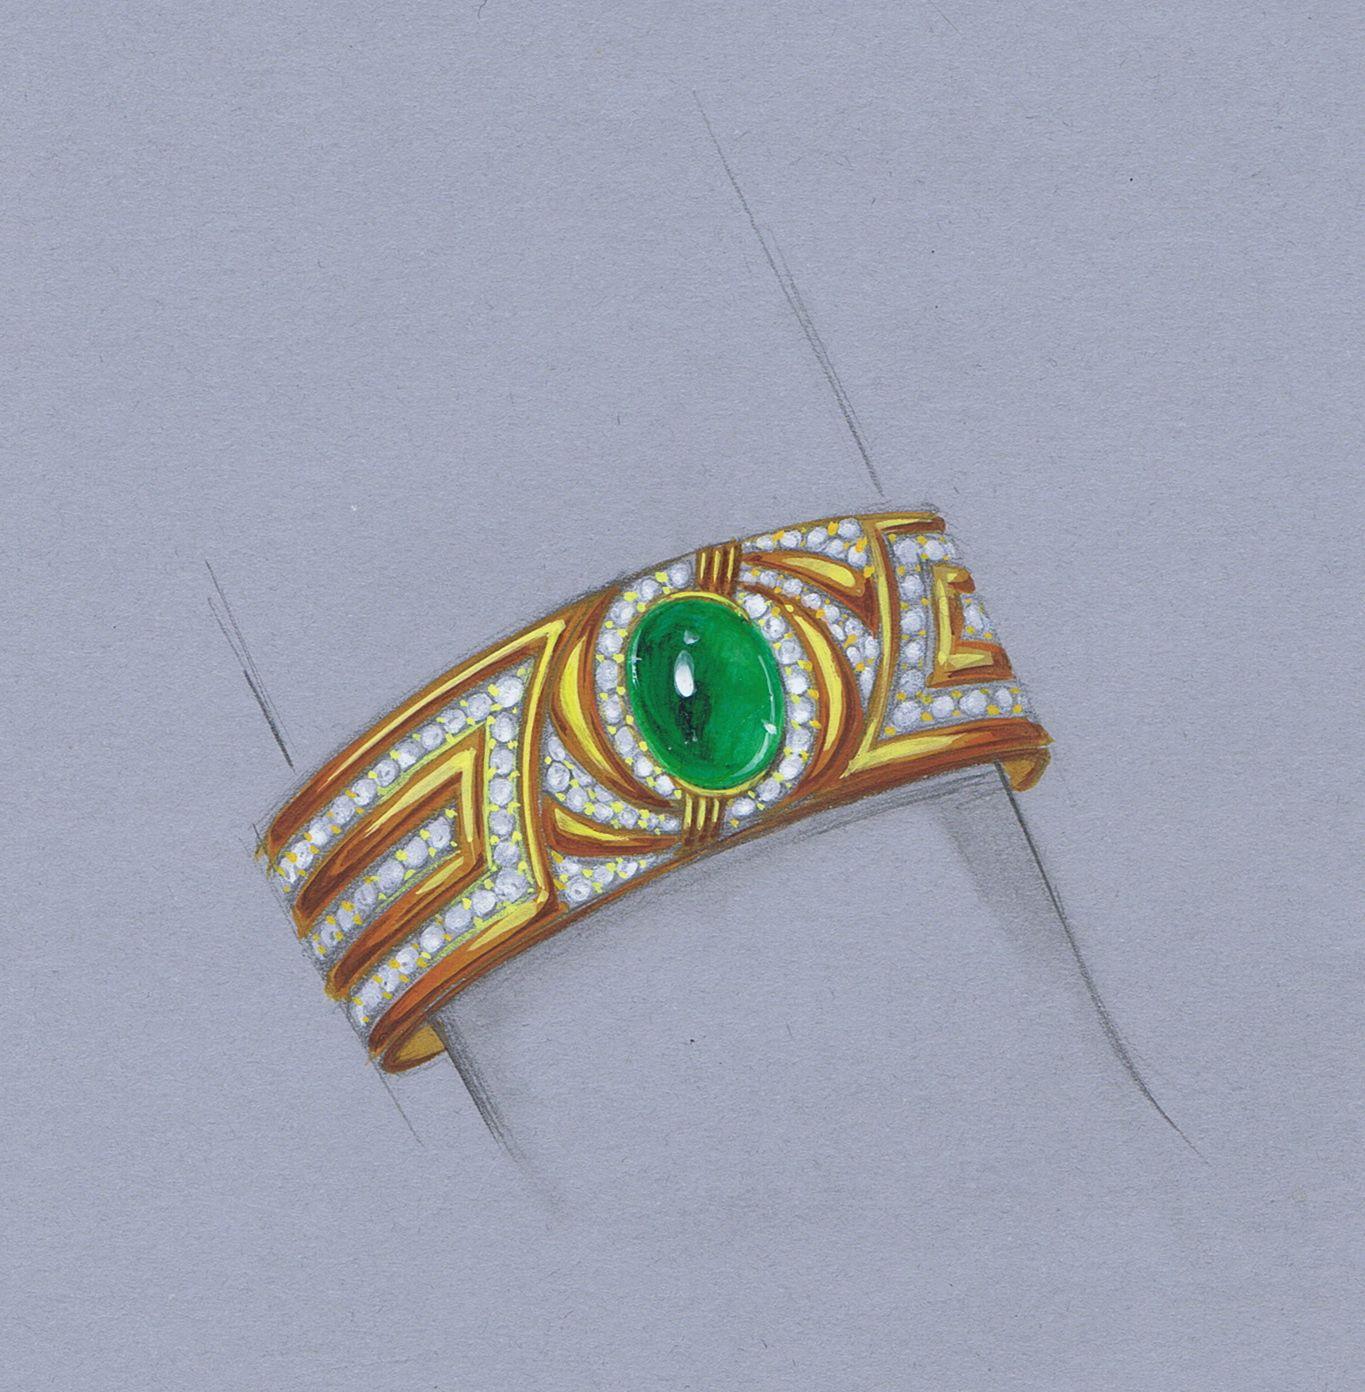 Pin by shashi sharma on g r pinterest jewelry jewelry design